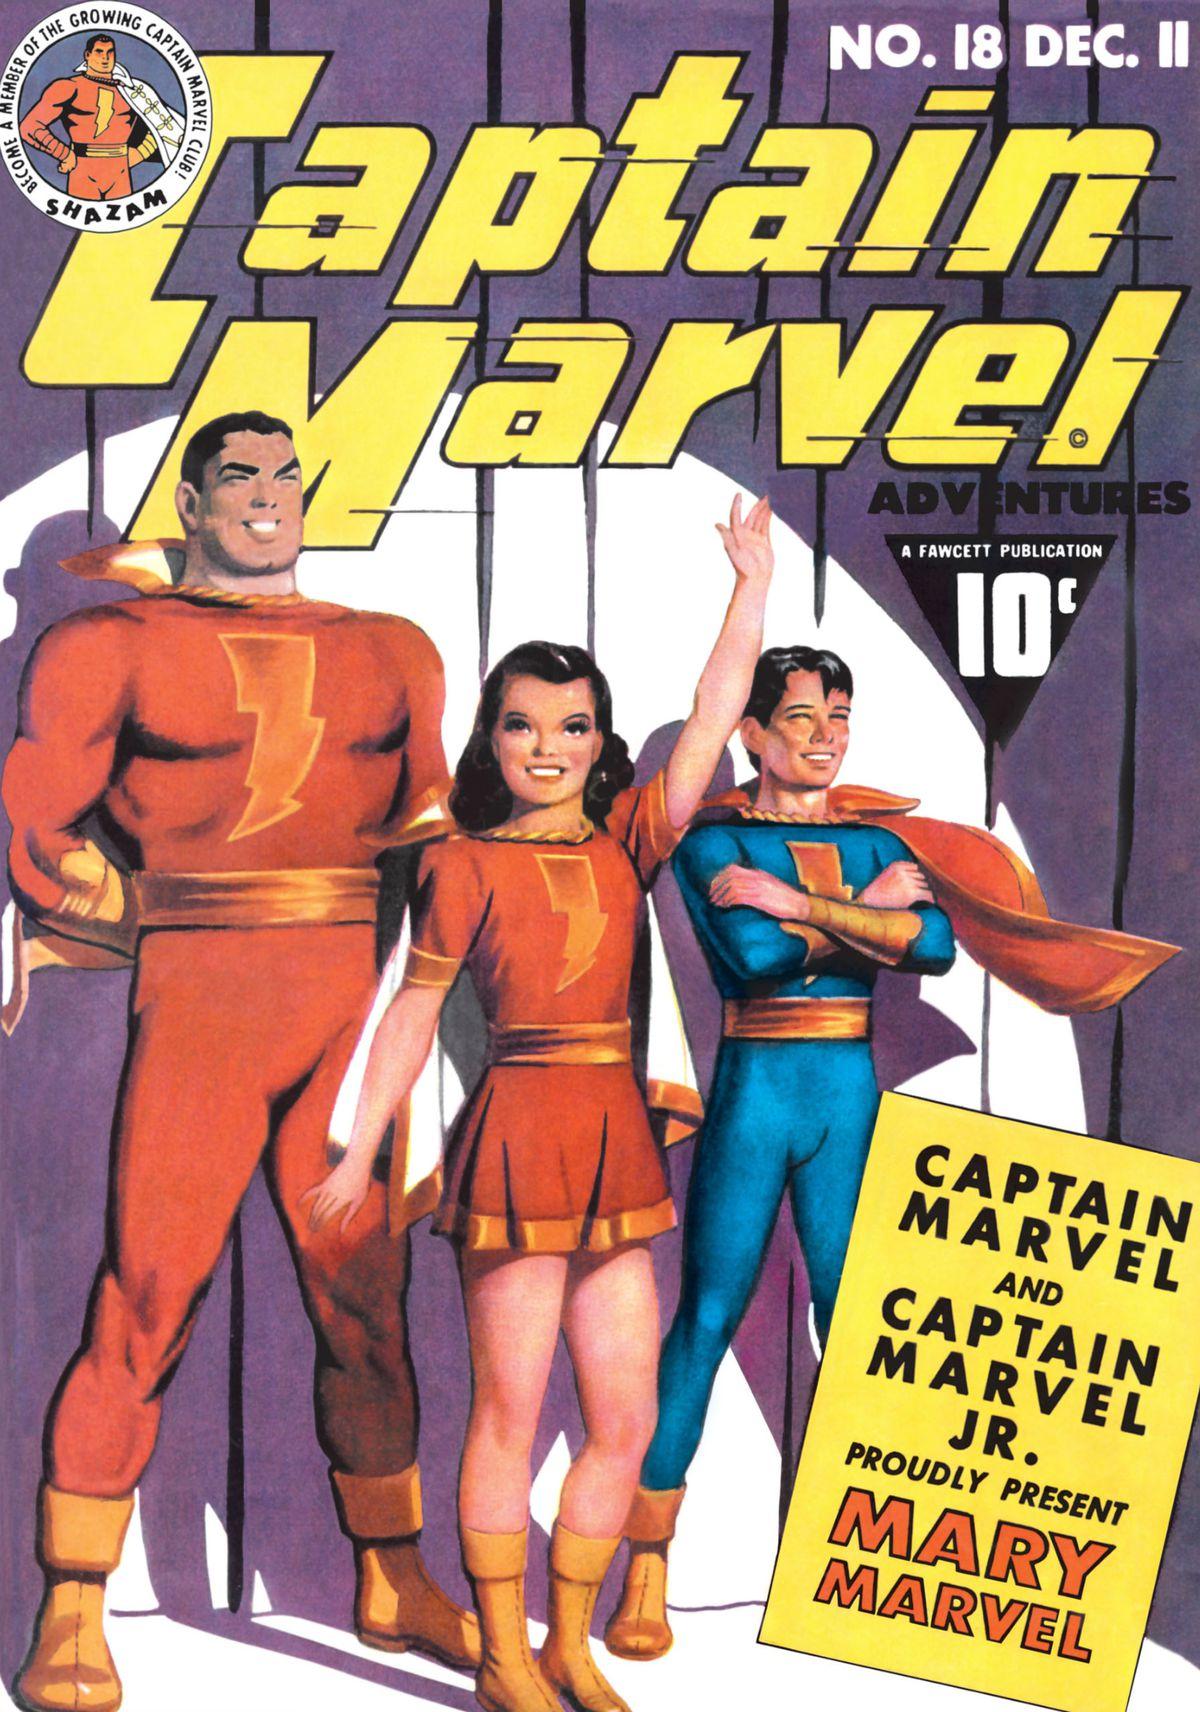 Cover of Captain Marvel Adventures # 18, Fawcett Comics, DC Comics (1942)